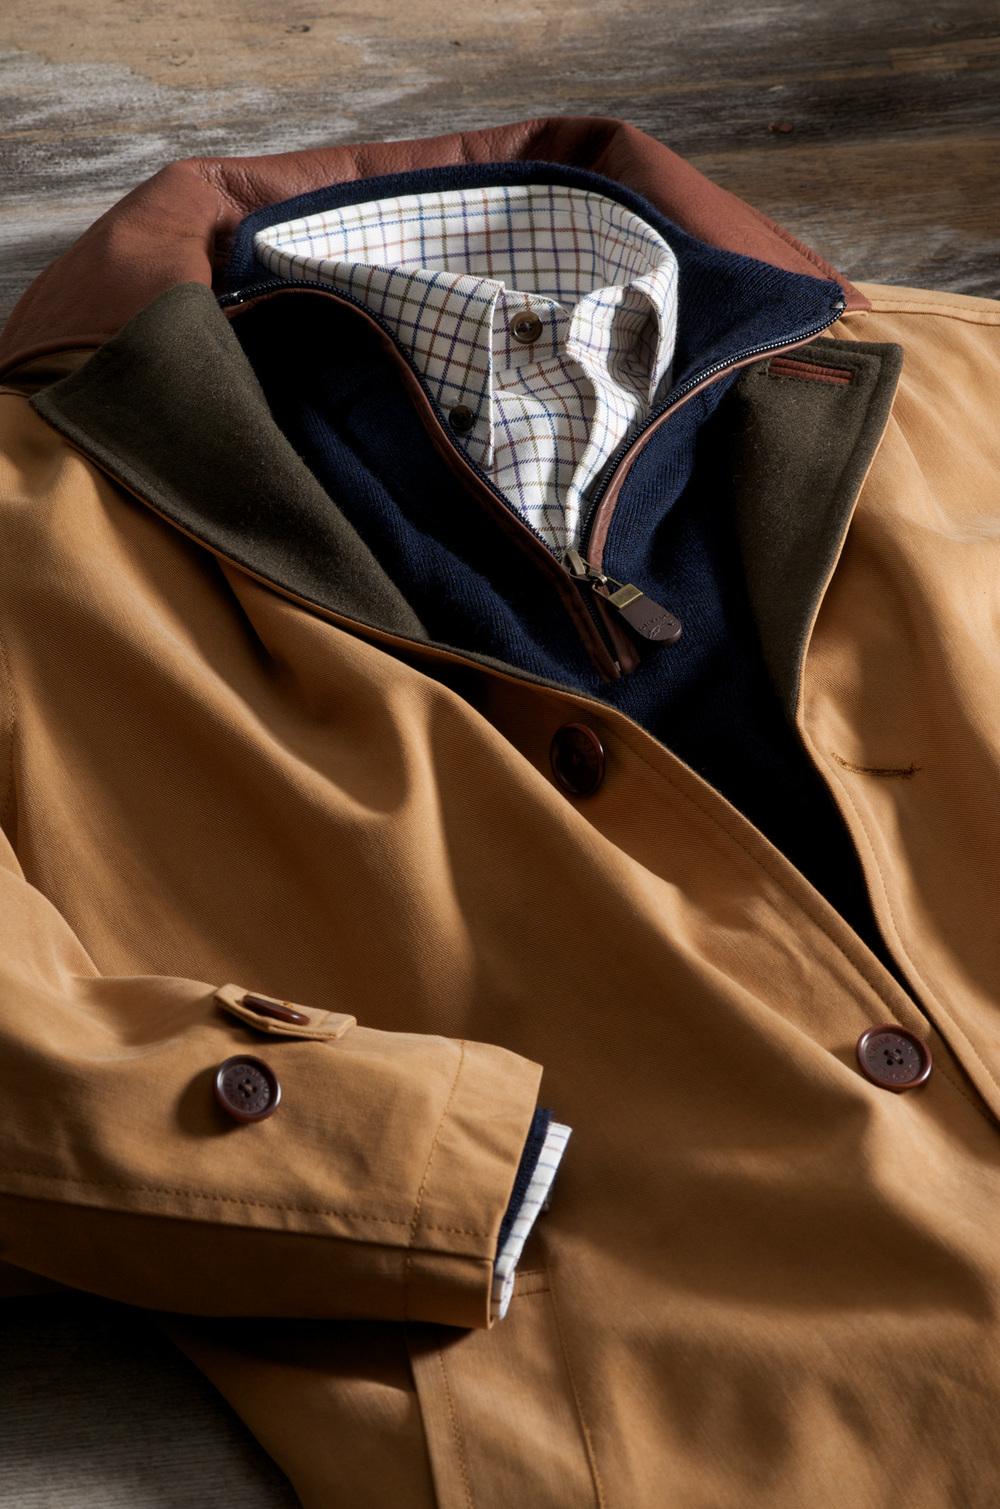 Stornaway Coat Front Cover  3729_2Kpx.jpg